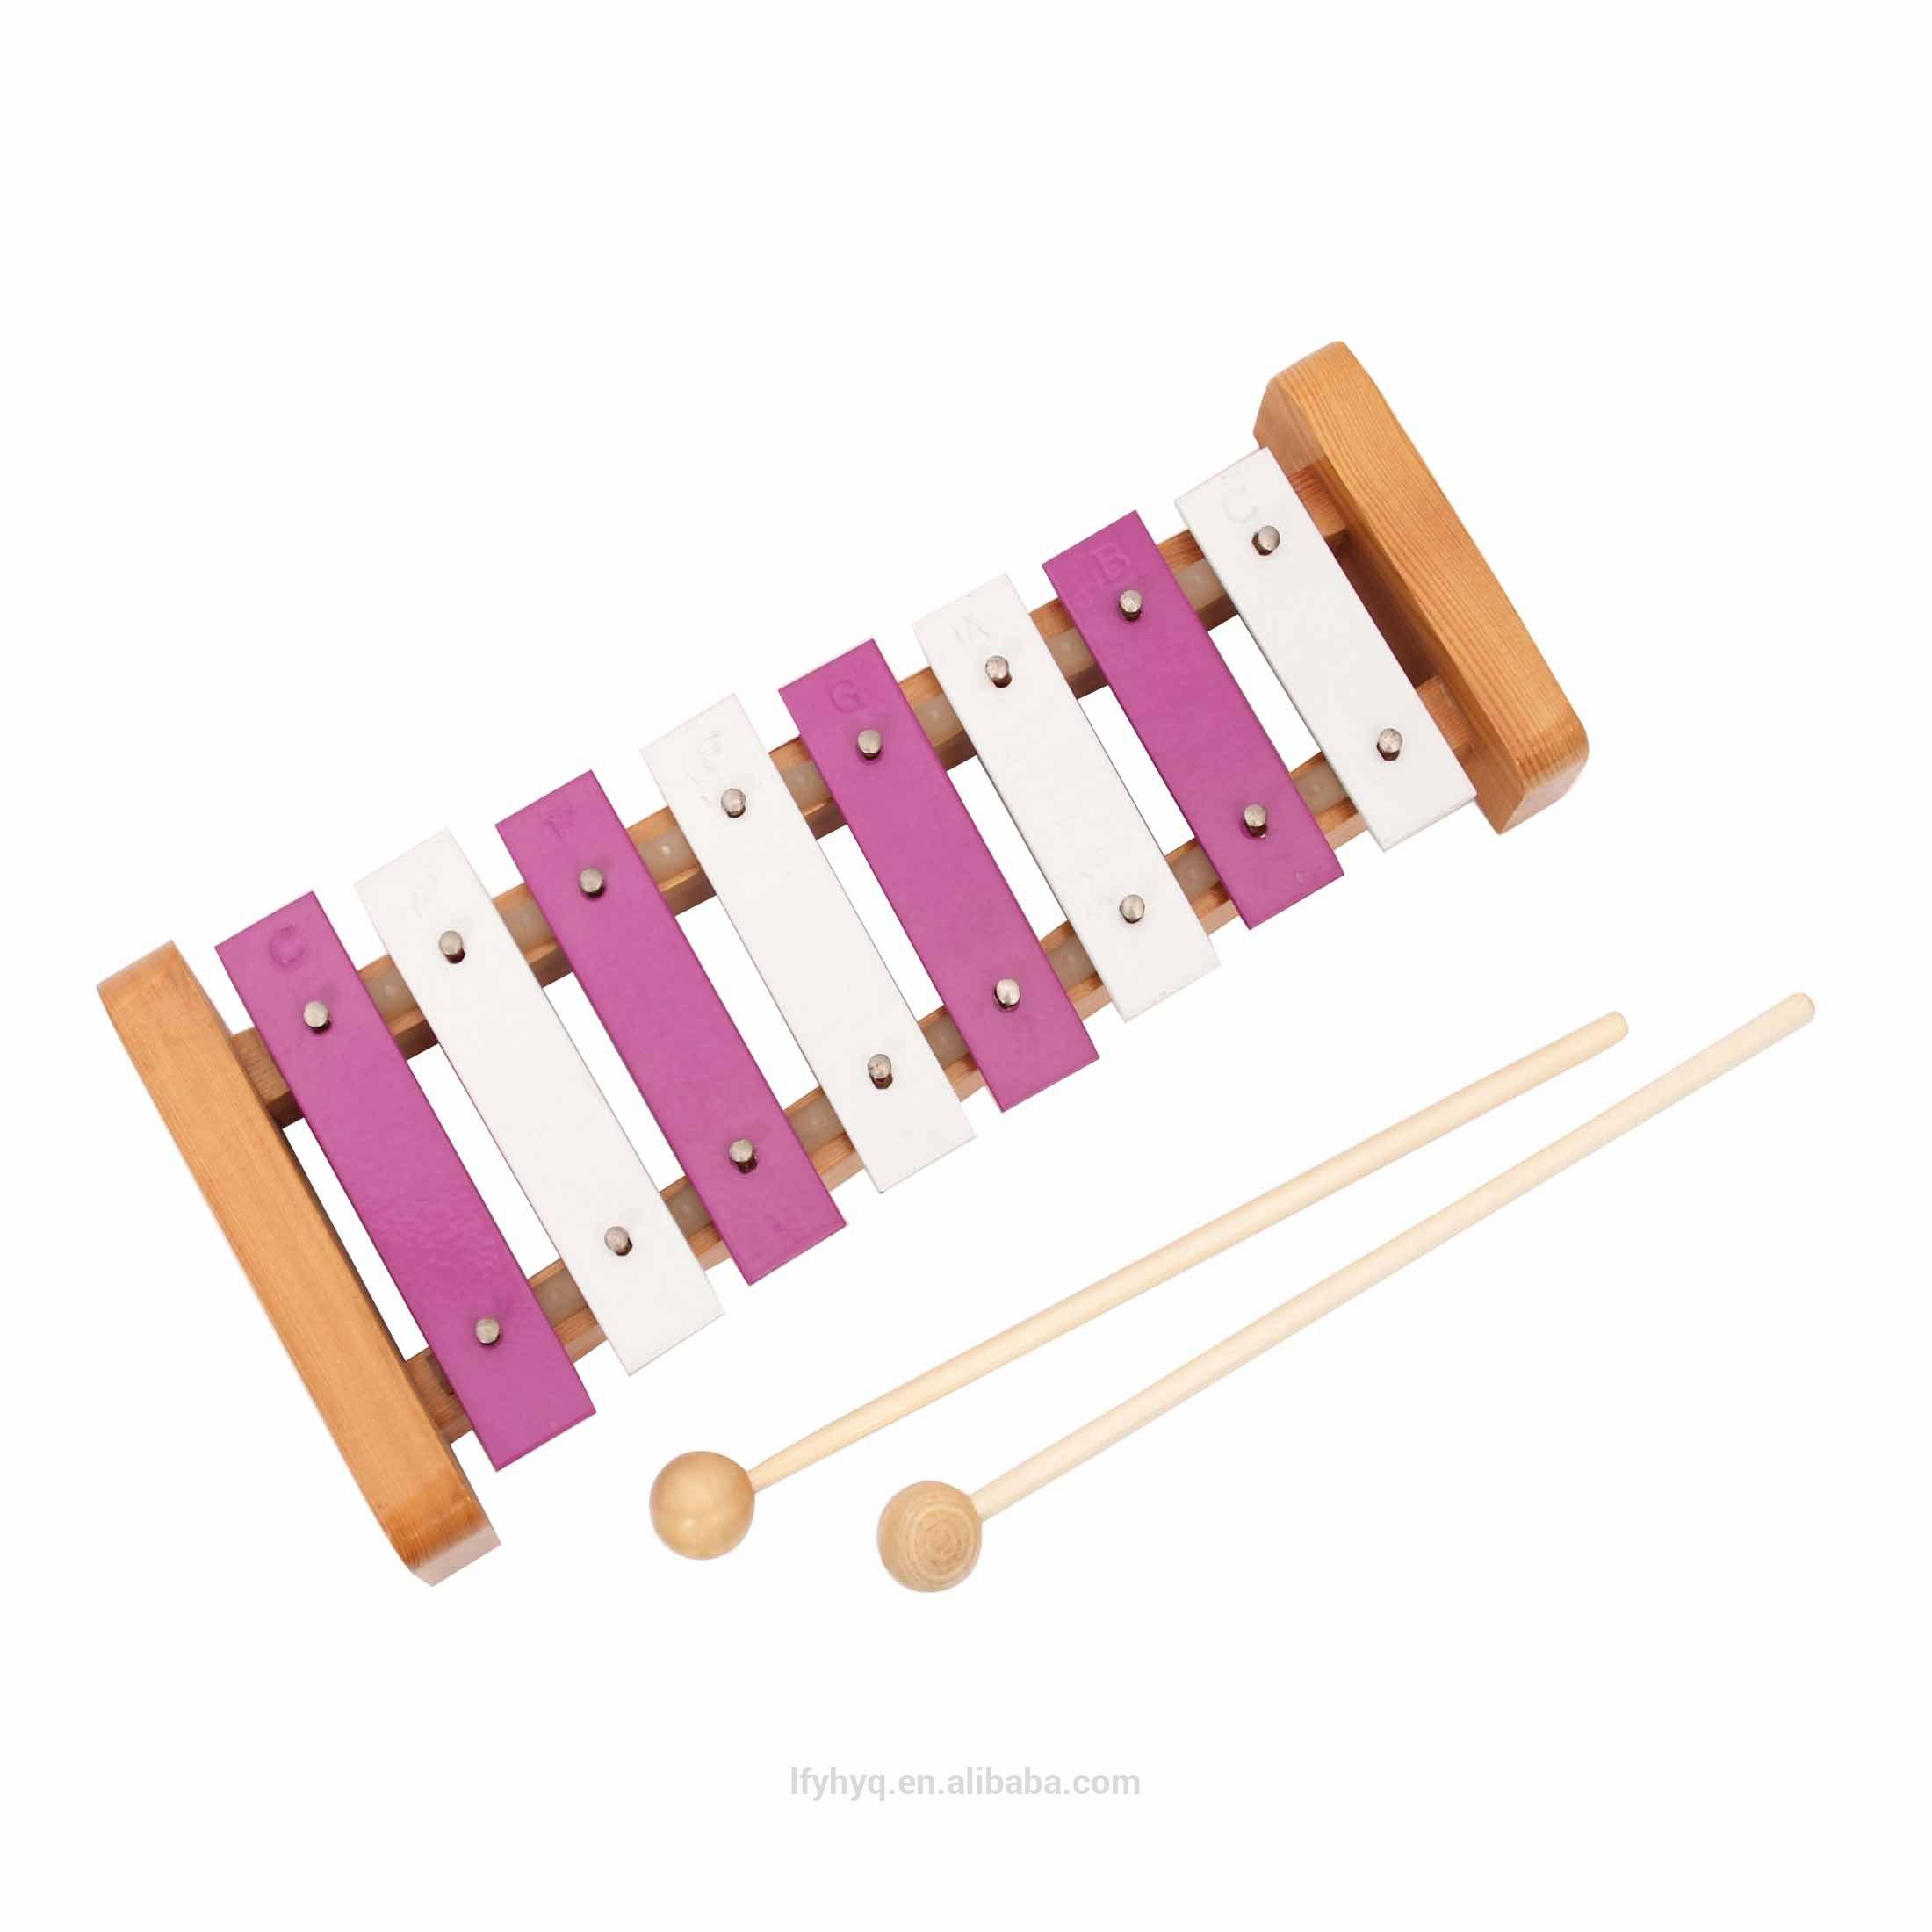 Wood Toys Australia Wood Xylophone Baby Toy